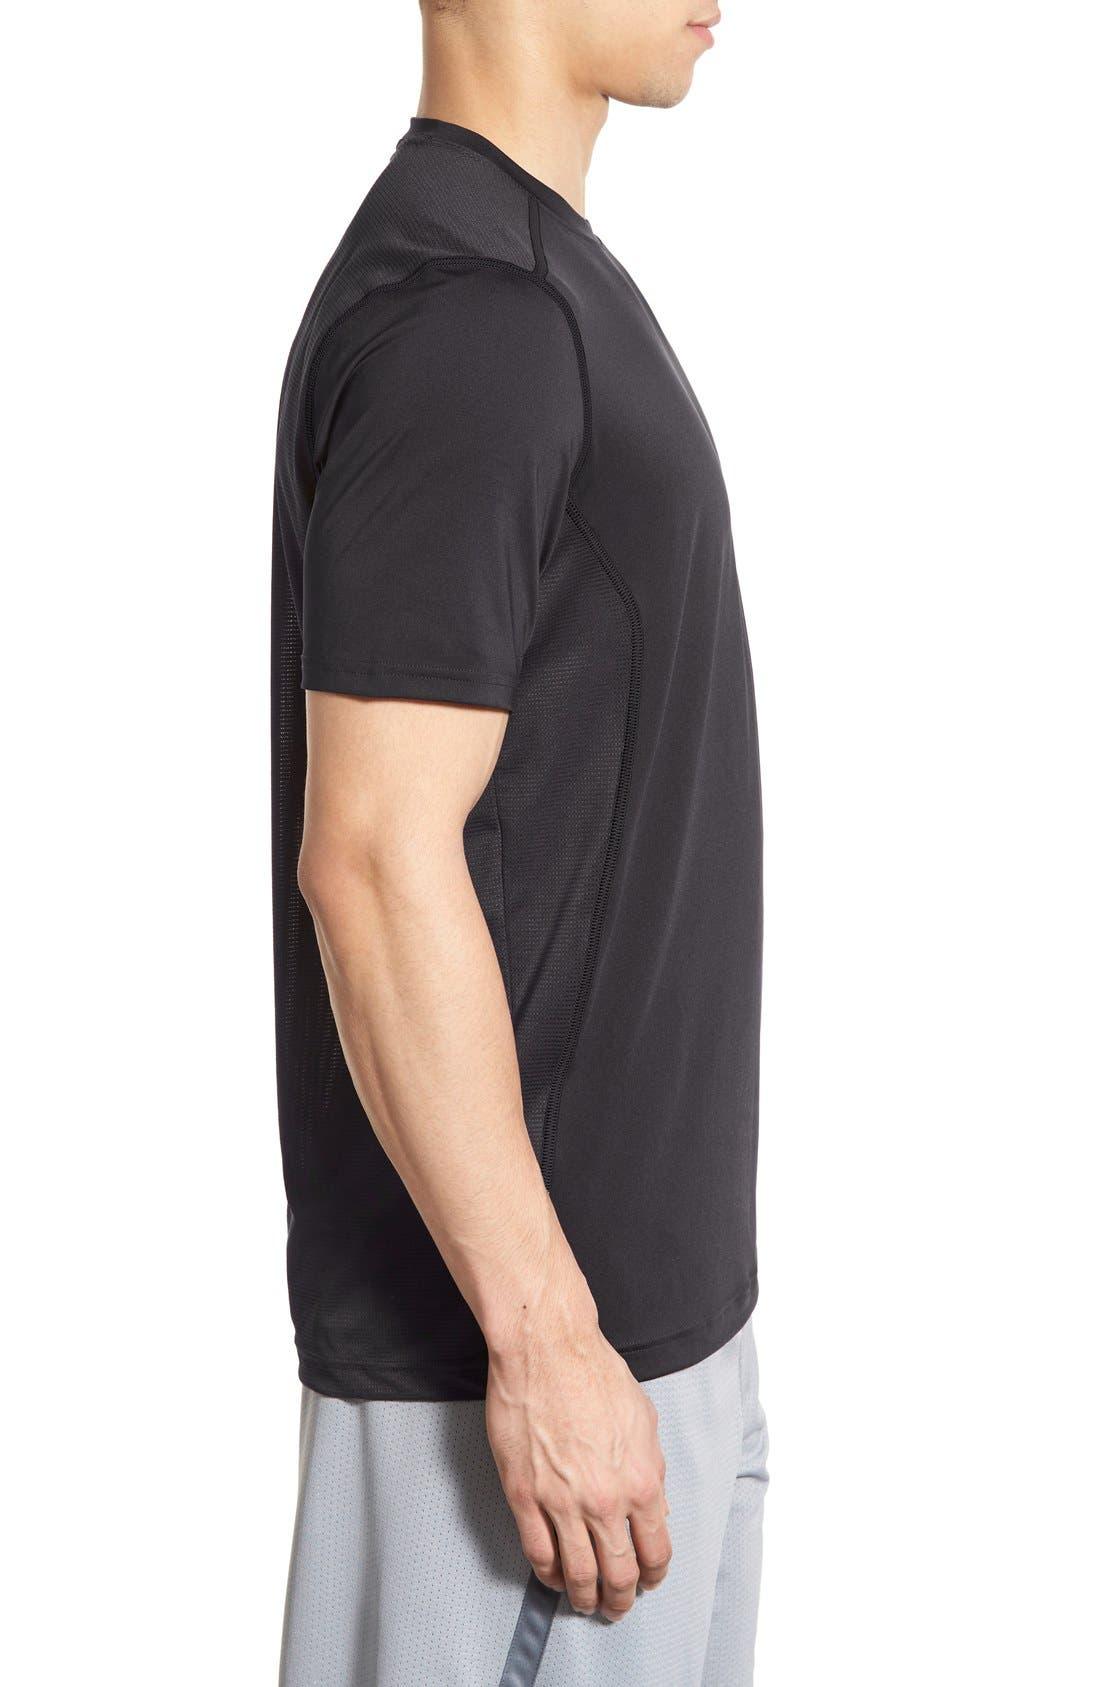 'Raid' HeatGear<sup>®</sup> Training T-Shirt,                             Alternate thumbnail 6, color,                             Black/ Black/ Graphite